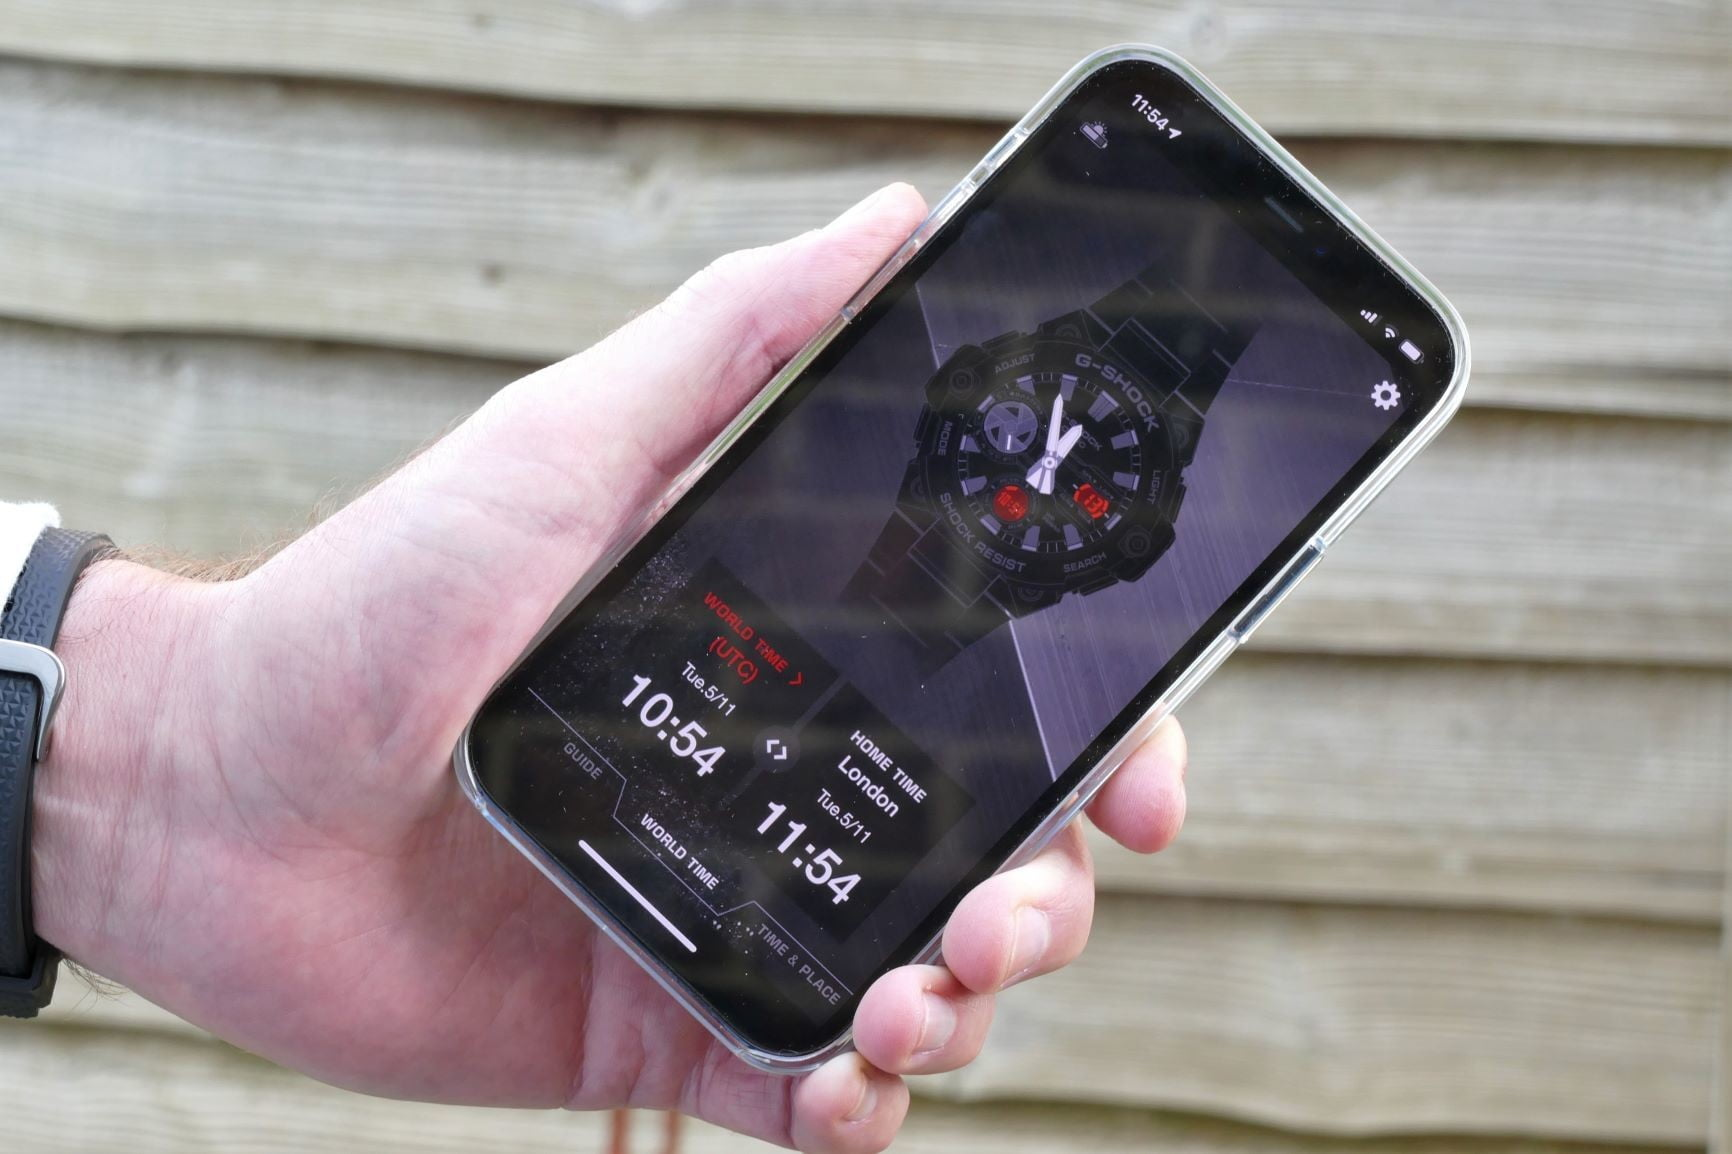 casio g shock steel gst b400 hands on features price photos release date app main